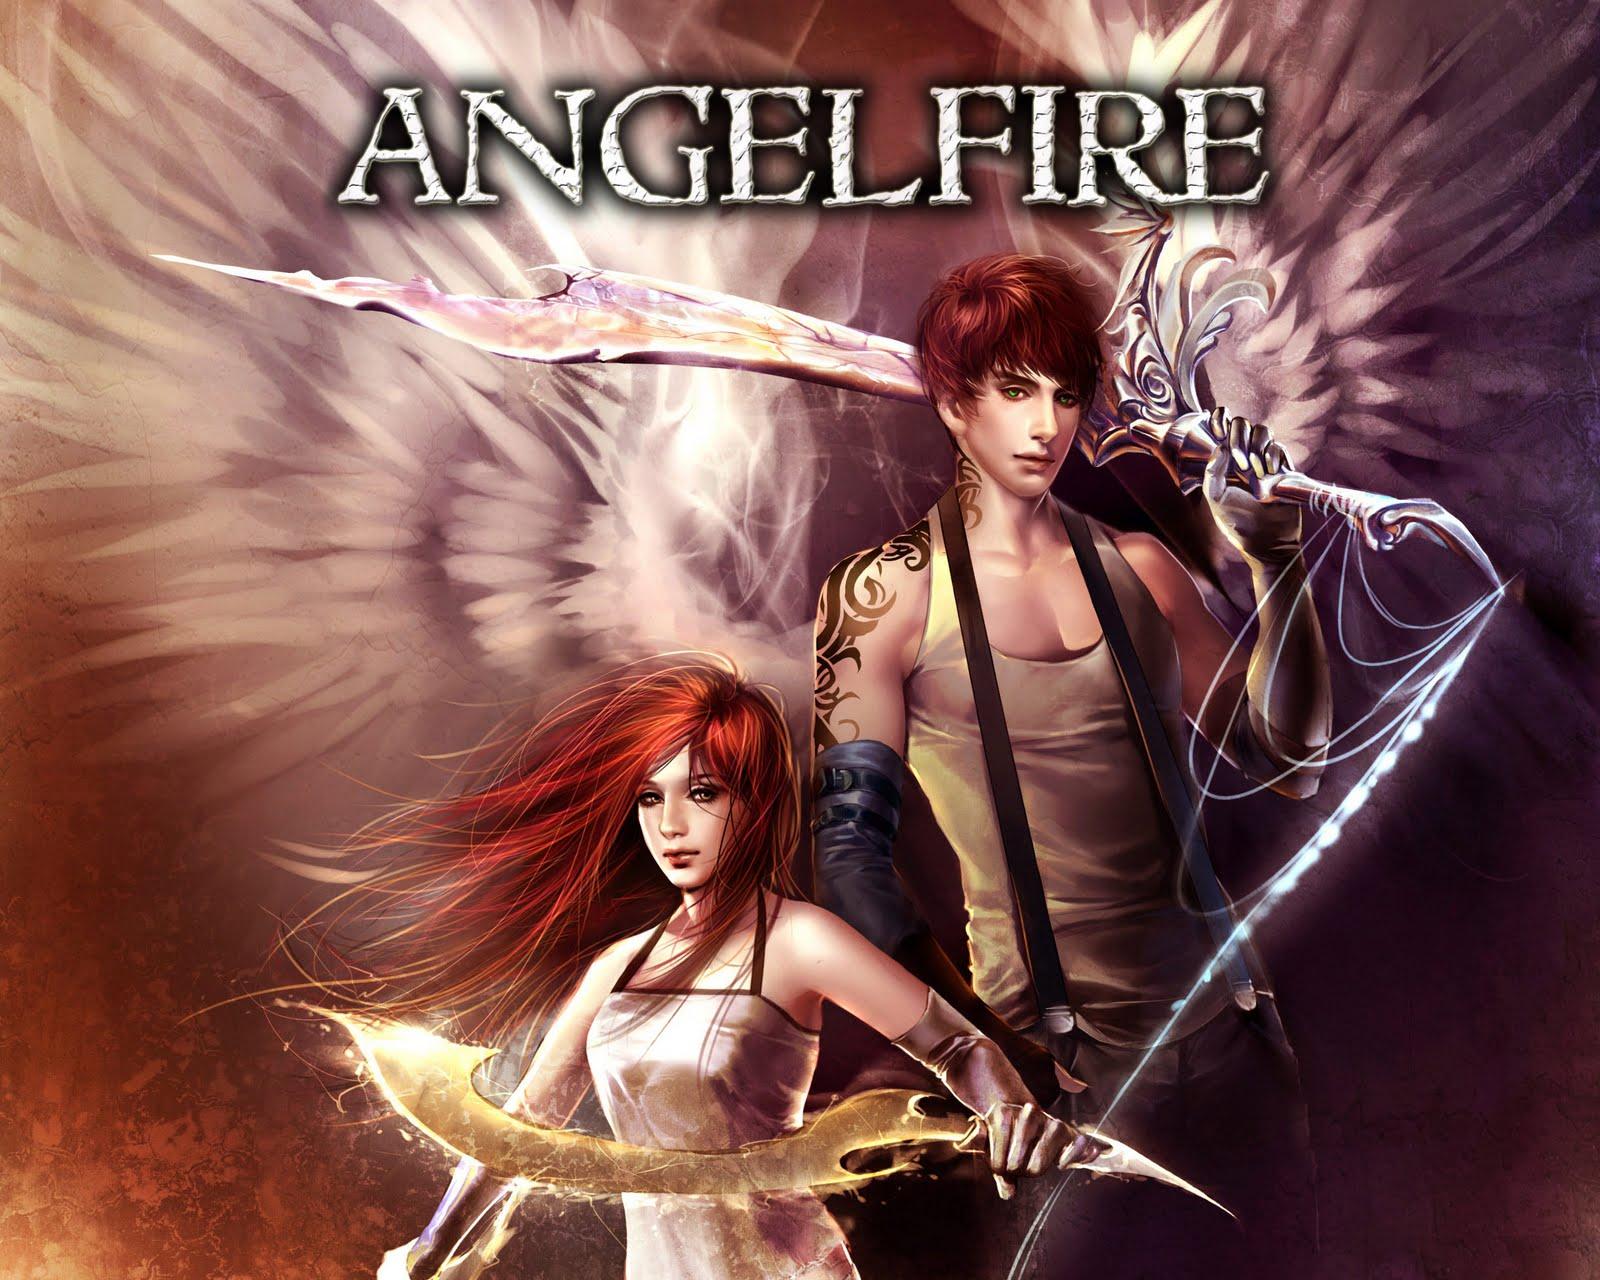 http://2.bp.blogspot.com/-Dn2SjvYV5dk/TLuiKtZykfI/AAAAAAAAARQ/7SAiP_t4F24/s1600/angelfire.jpg